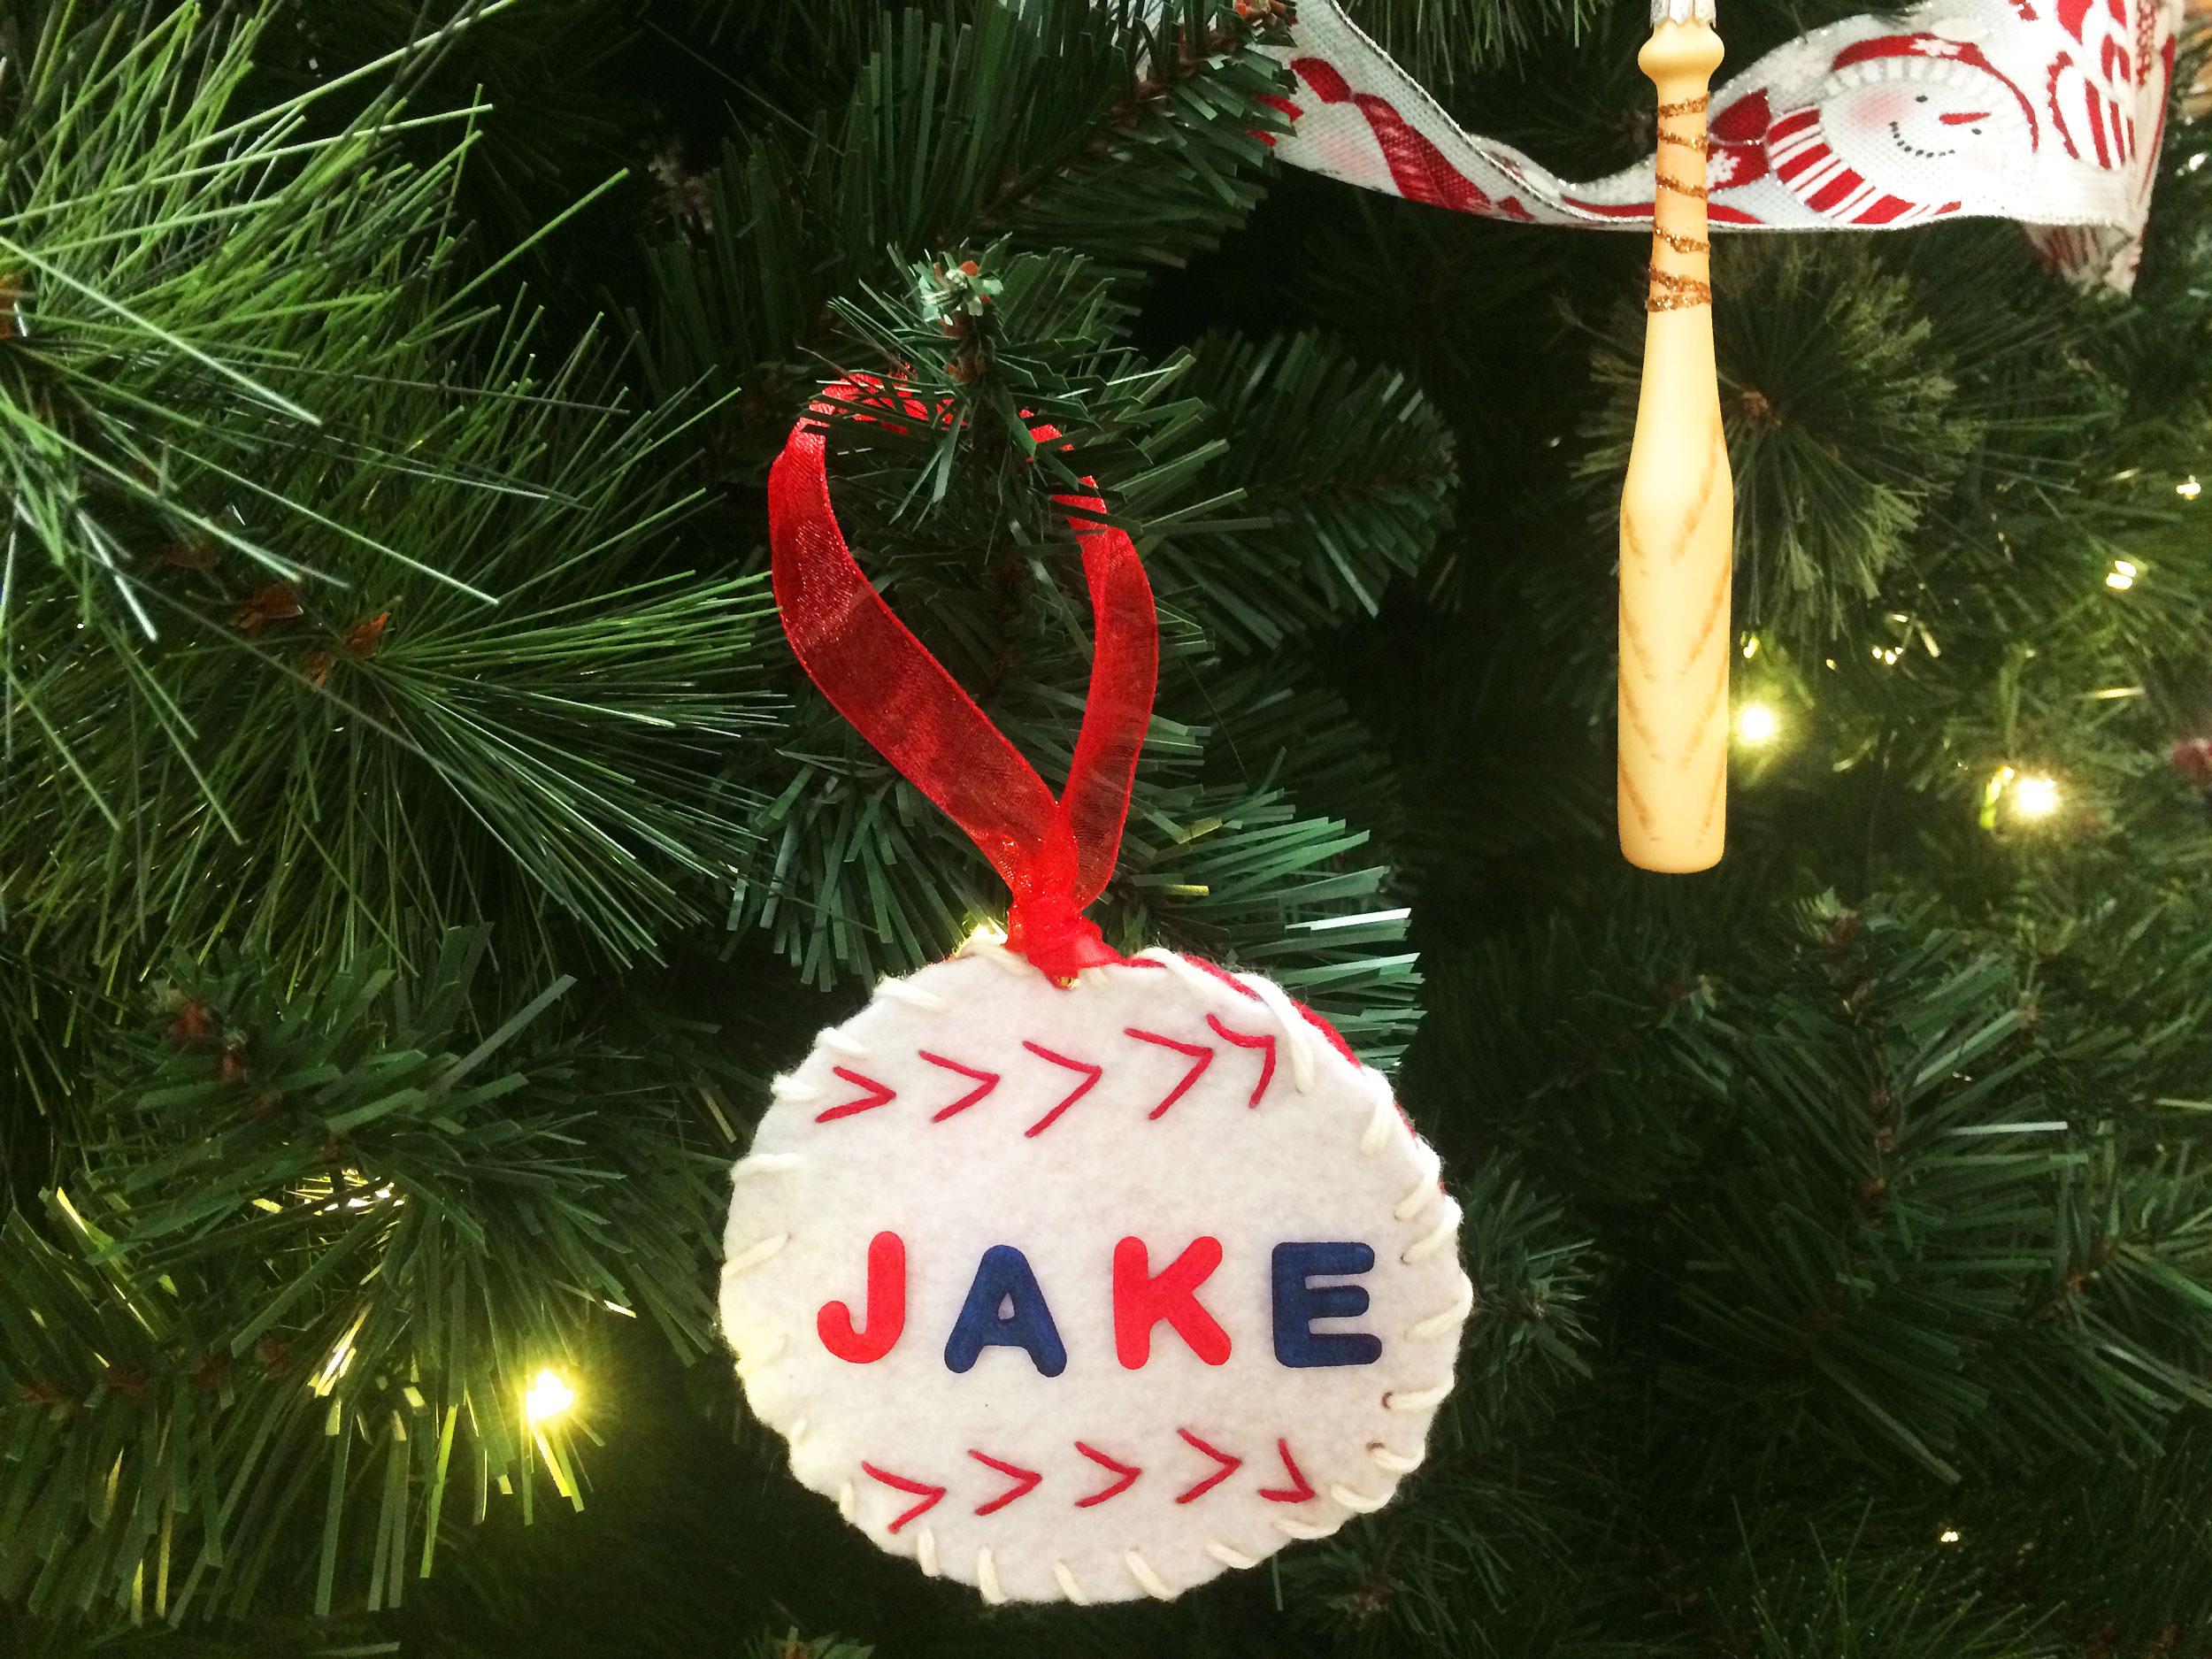 Finished DIY baseball ornament hanging on Christmas tree.   OrnamentShop.com